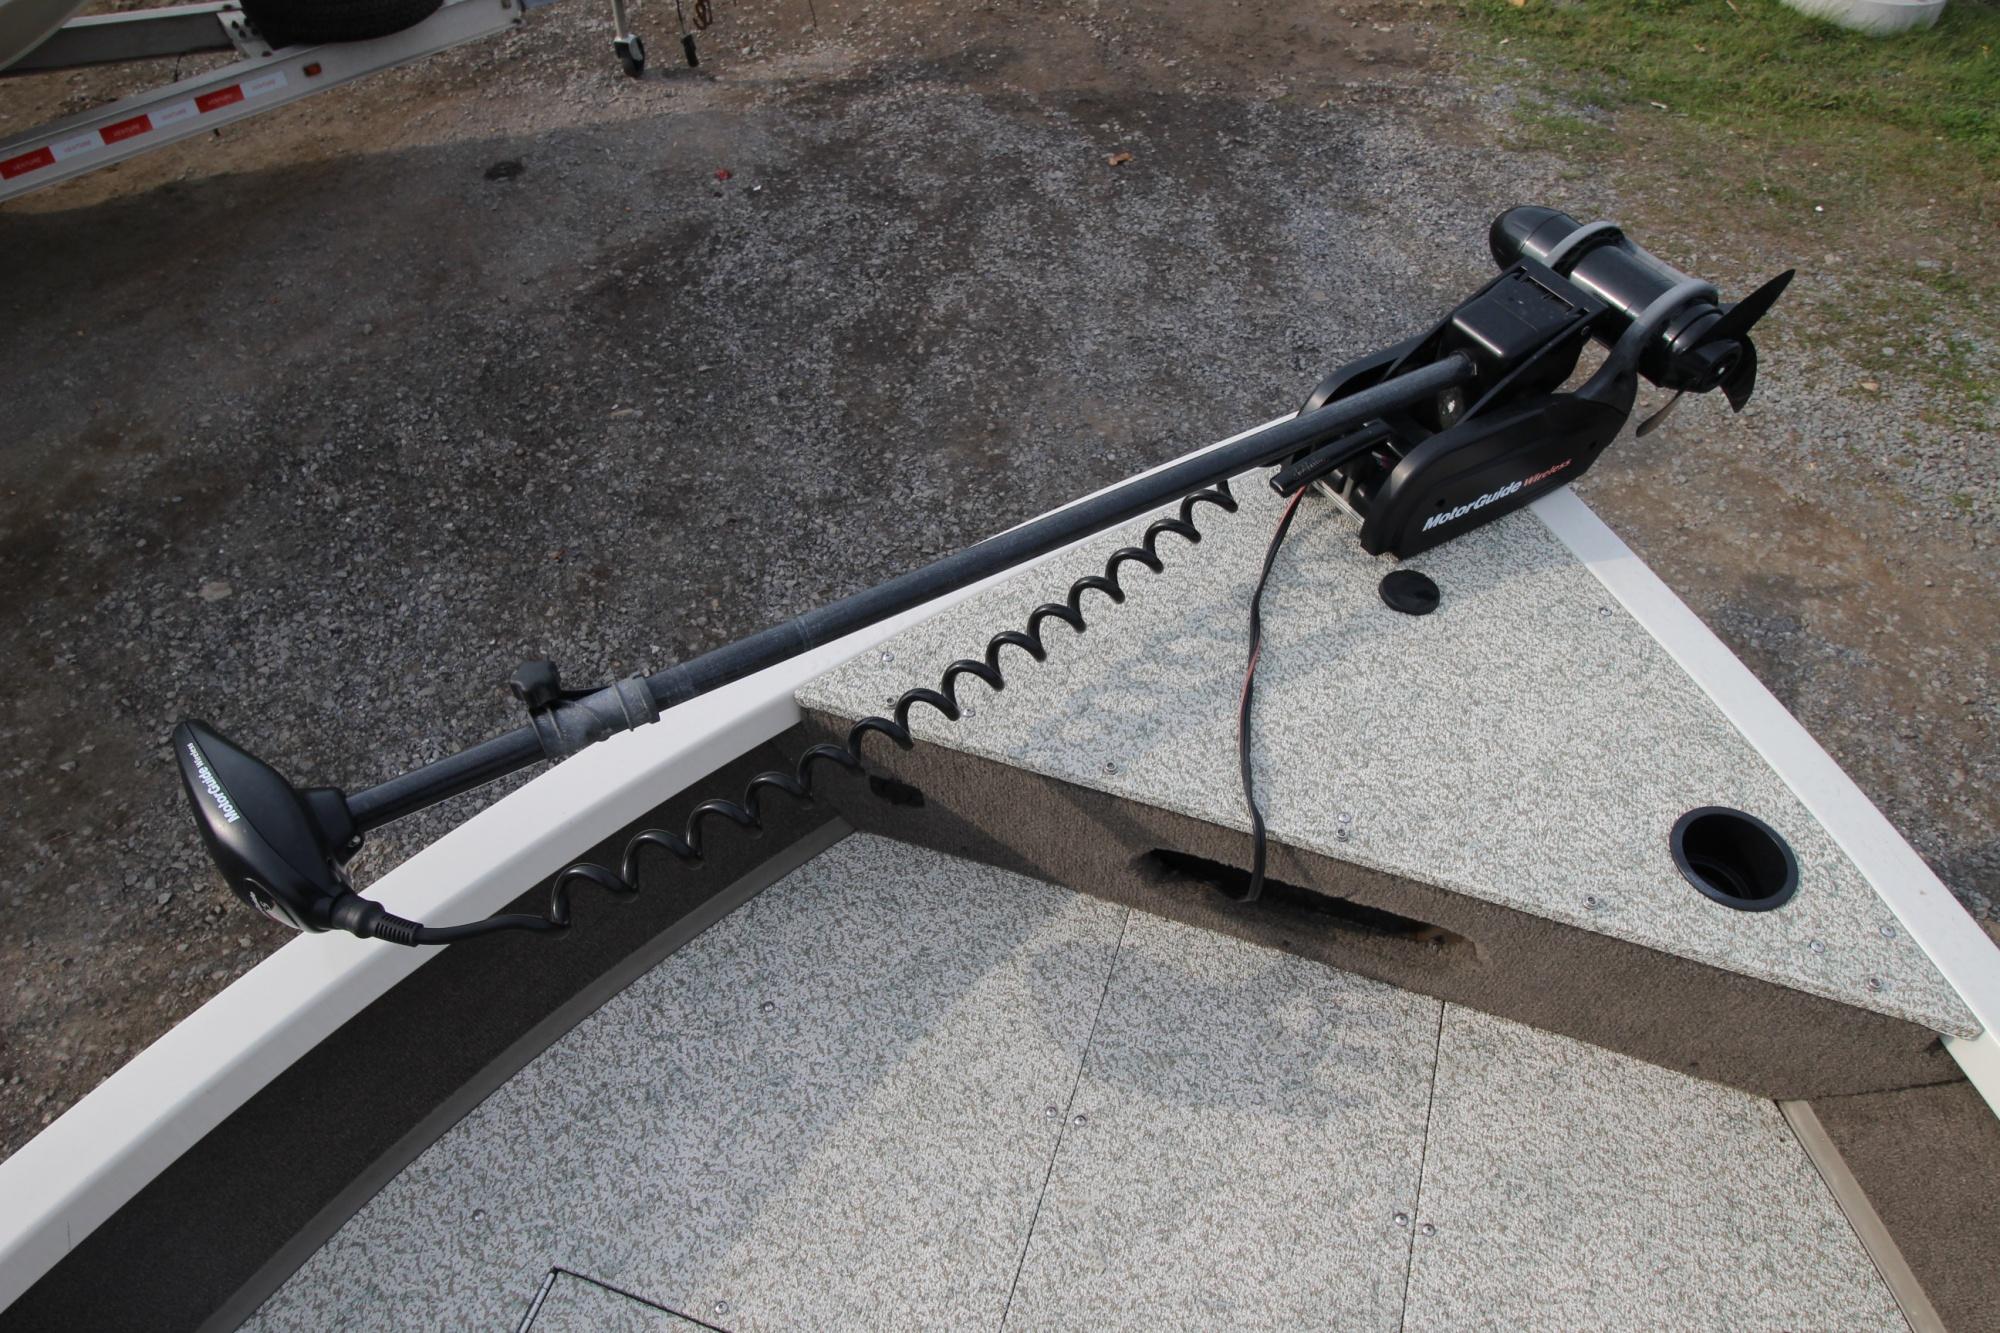 CRESLINER 1650 FISH HAWK - IMG_0115